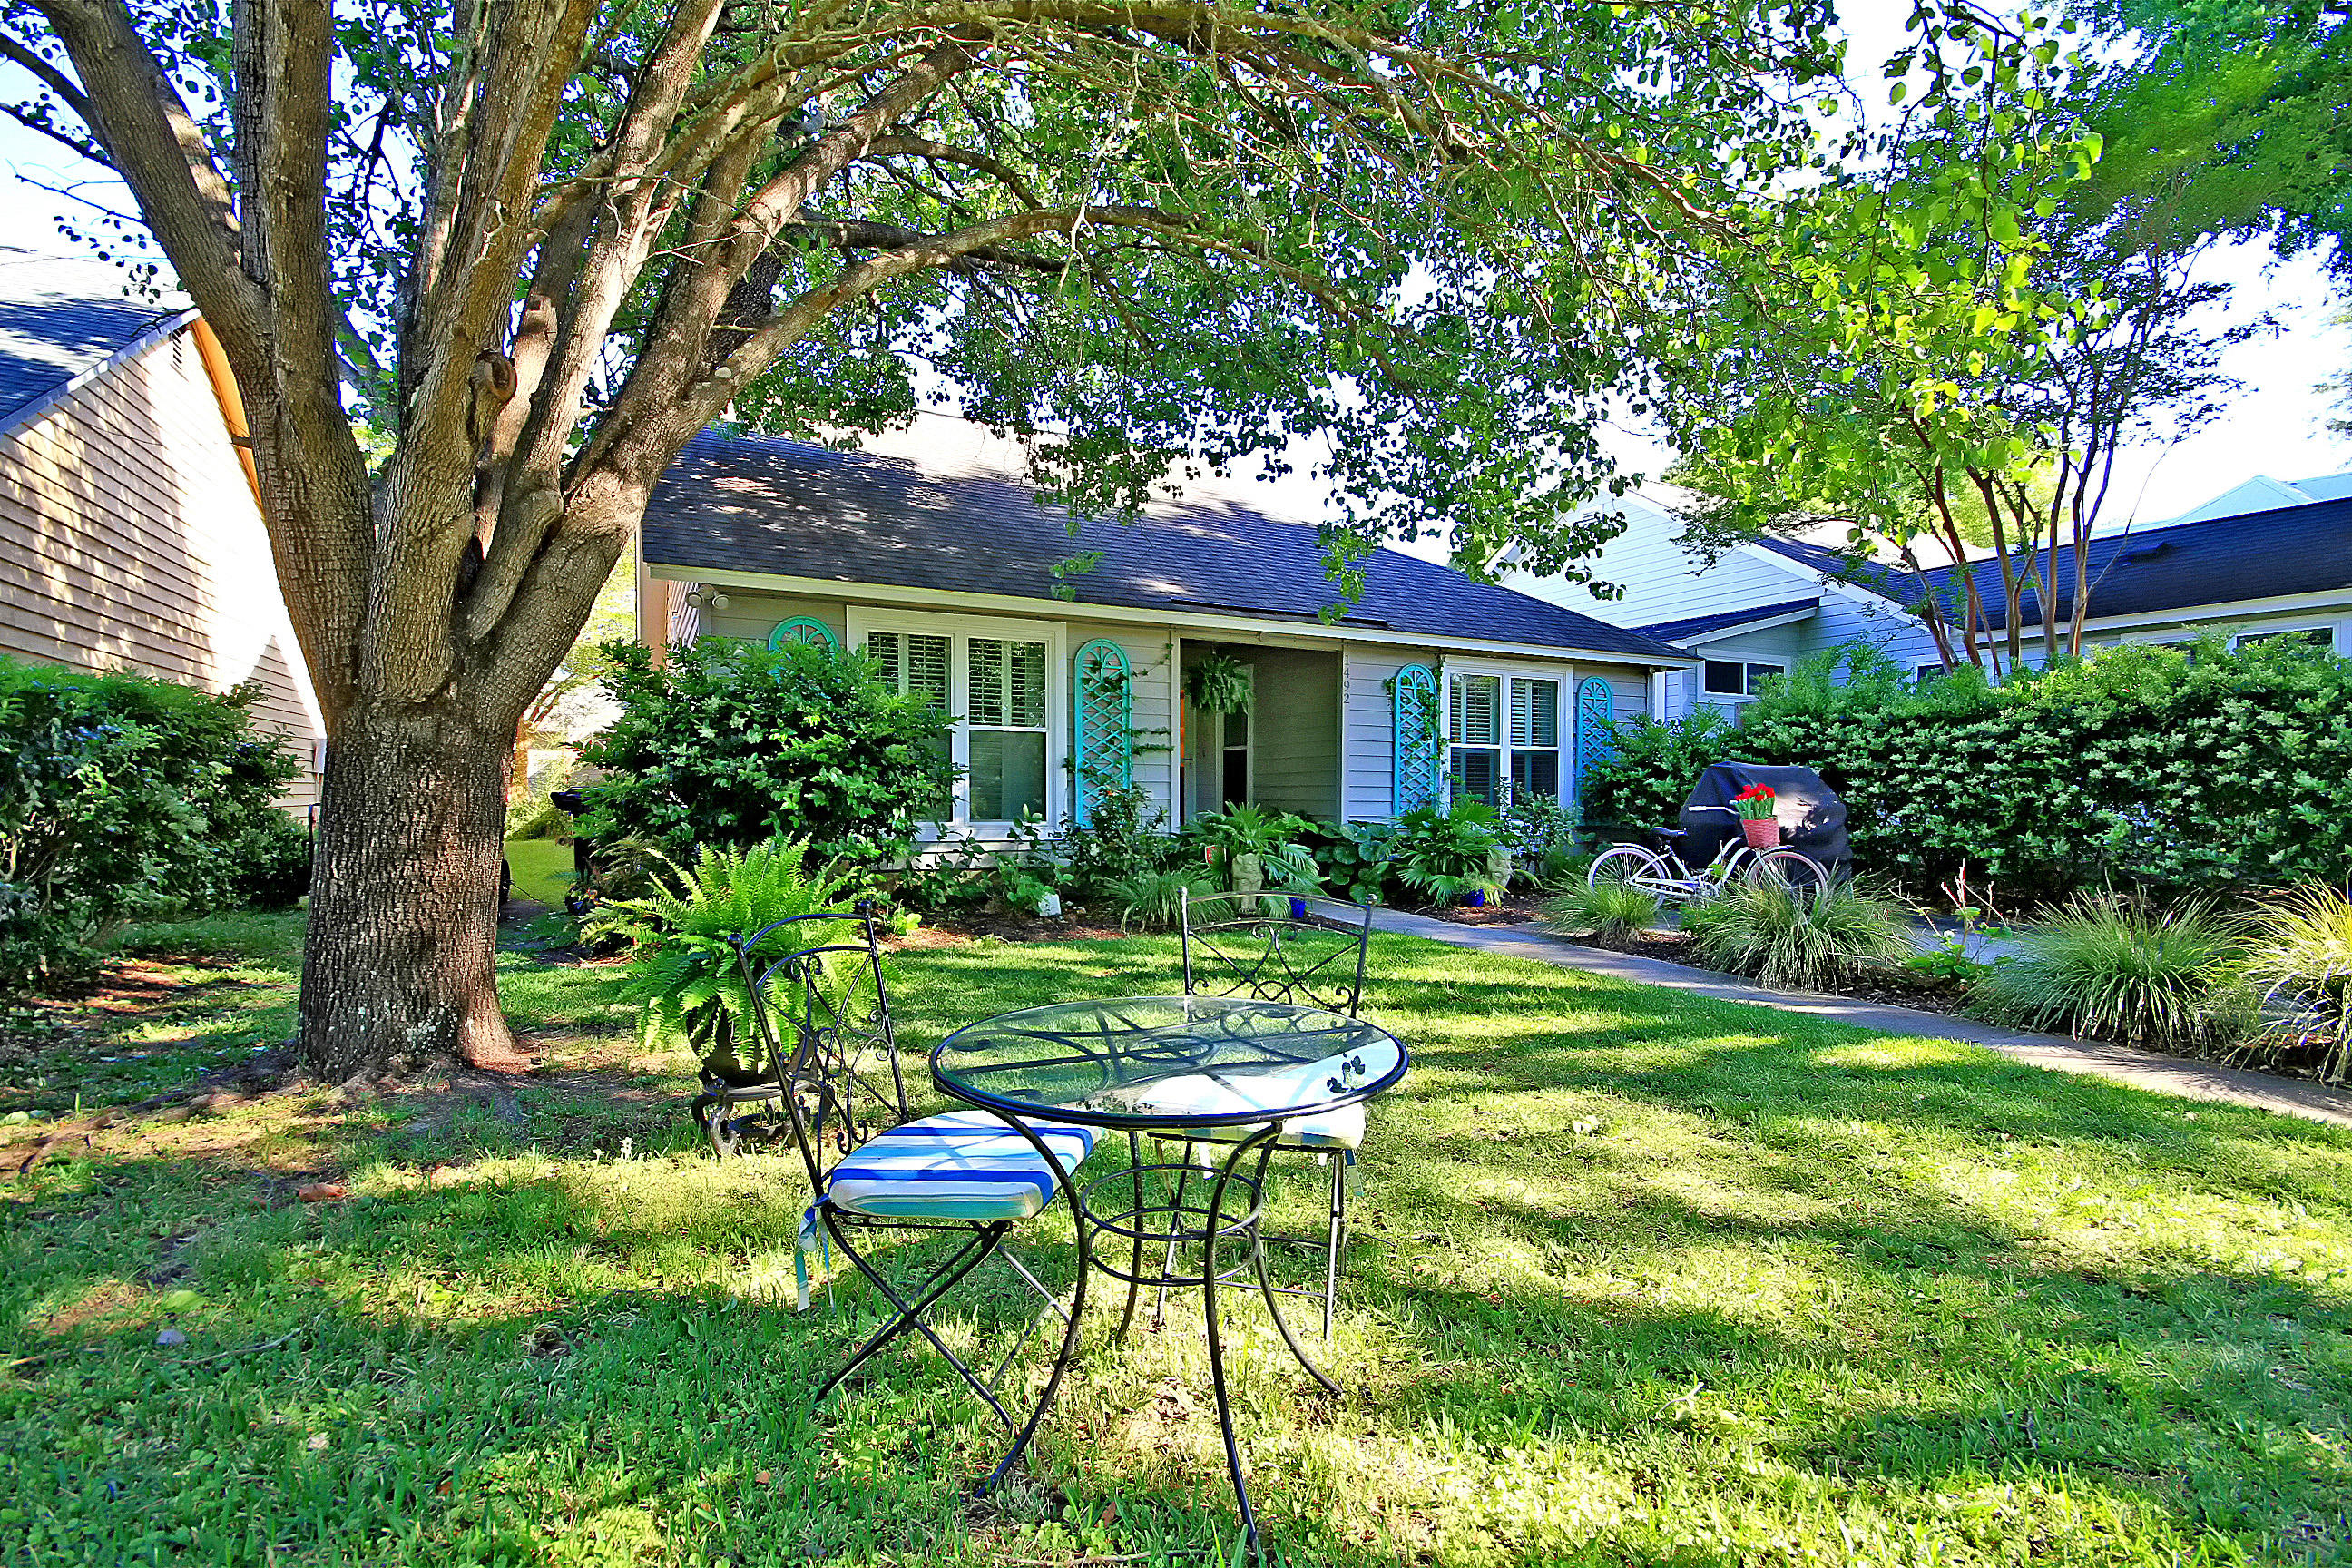 Pirates Cove Homes For Sale - 1492 Ketch, Mount Pleasant, SC - 16